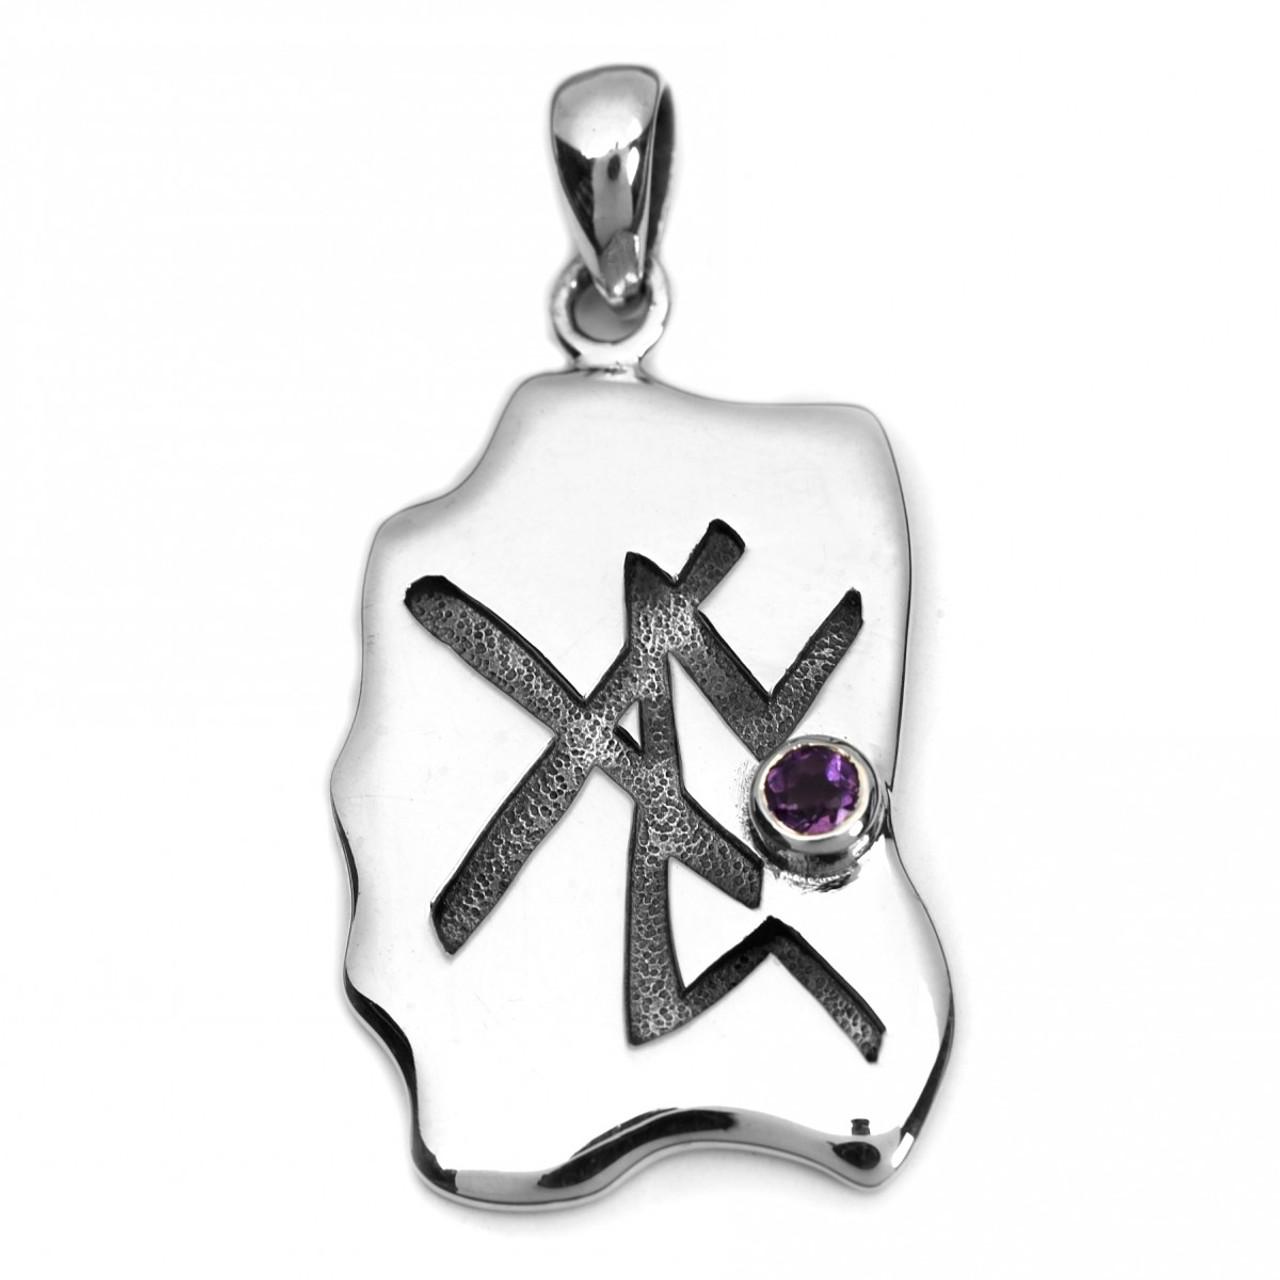 Psychic Power Bind Rune Pendant (Sterling Silver)